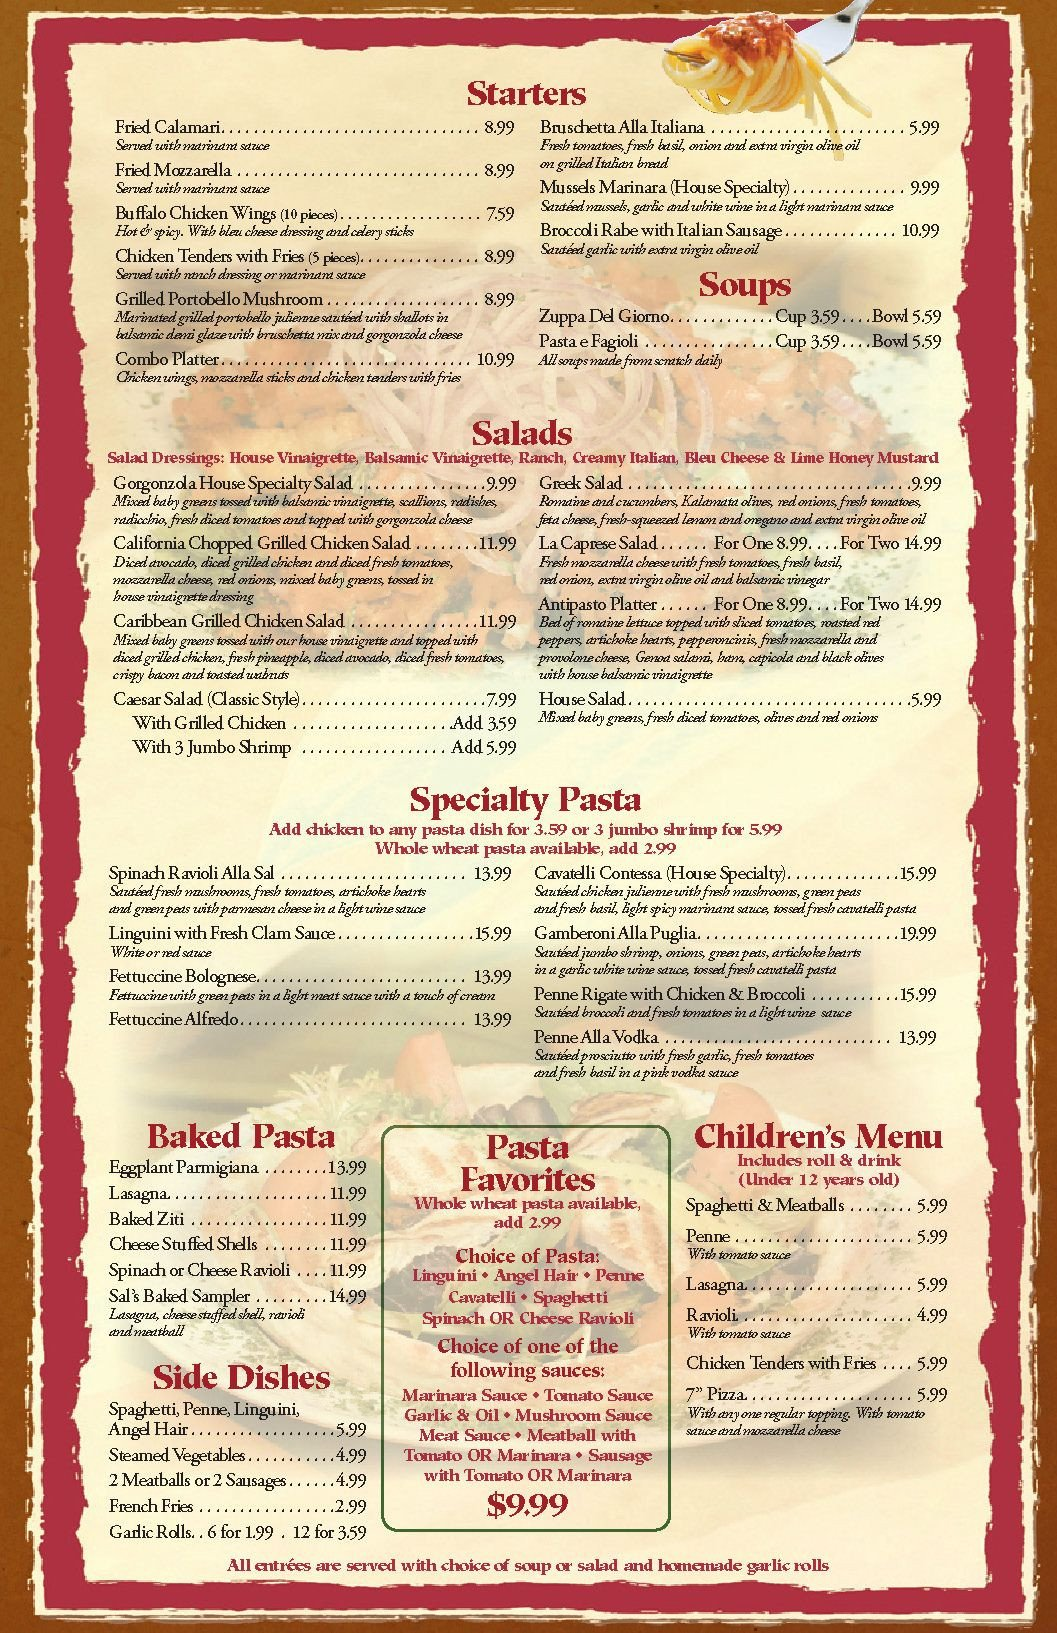 Blank Restaurant Menu Template Free Blank Restaurant Menu Templates